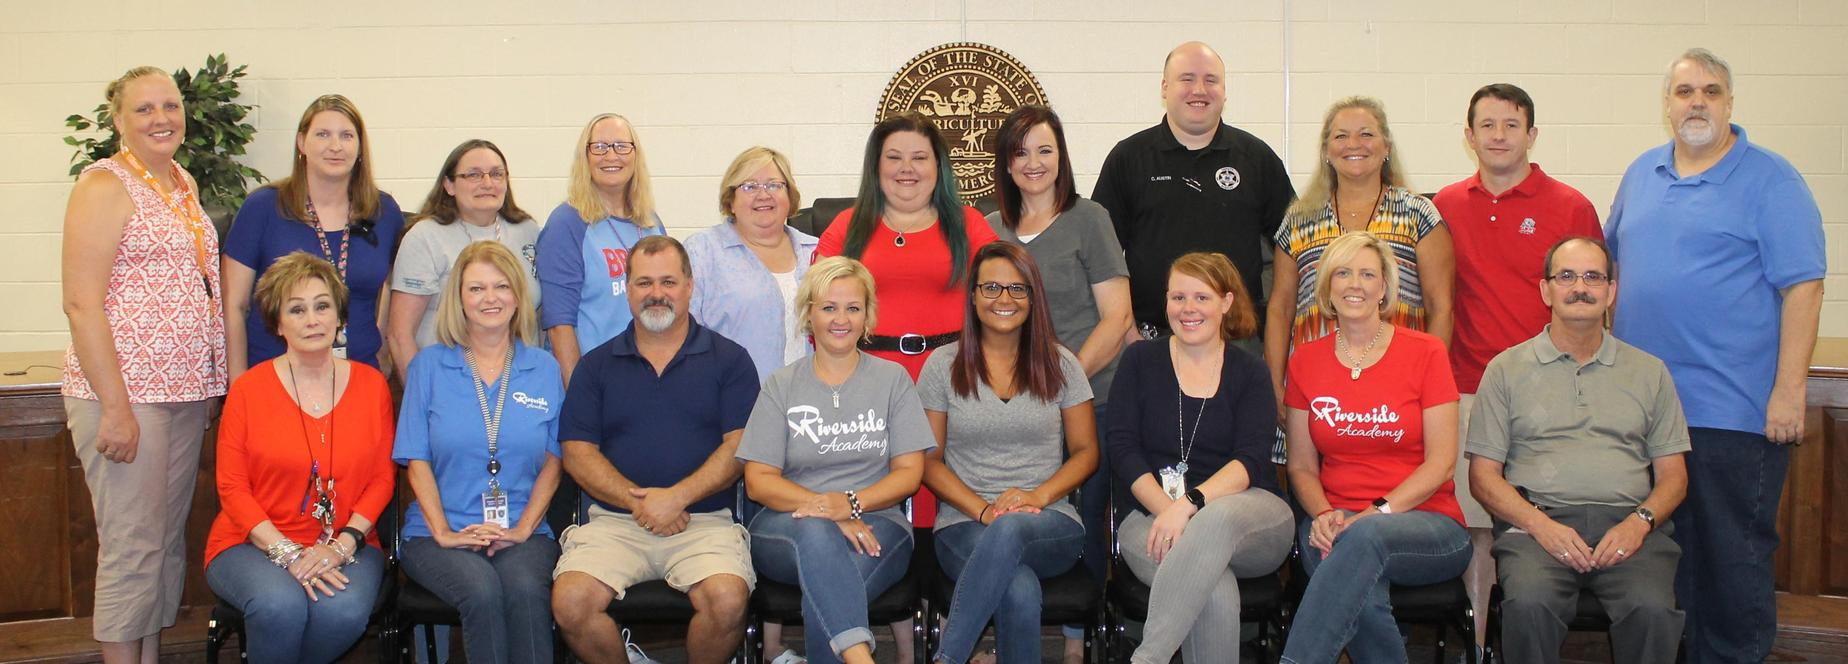 Riverside Academy staff